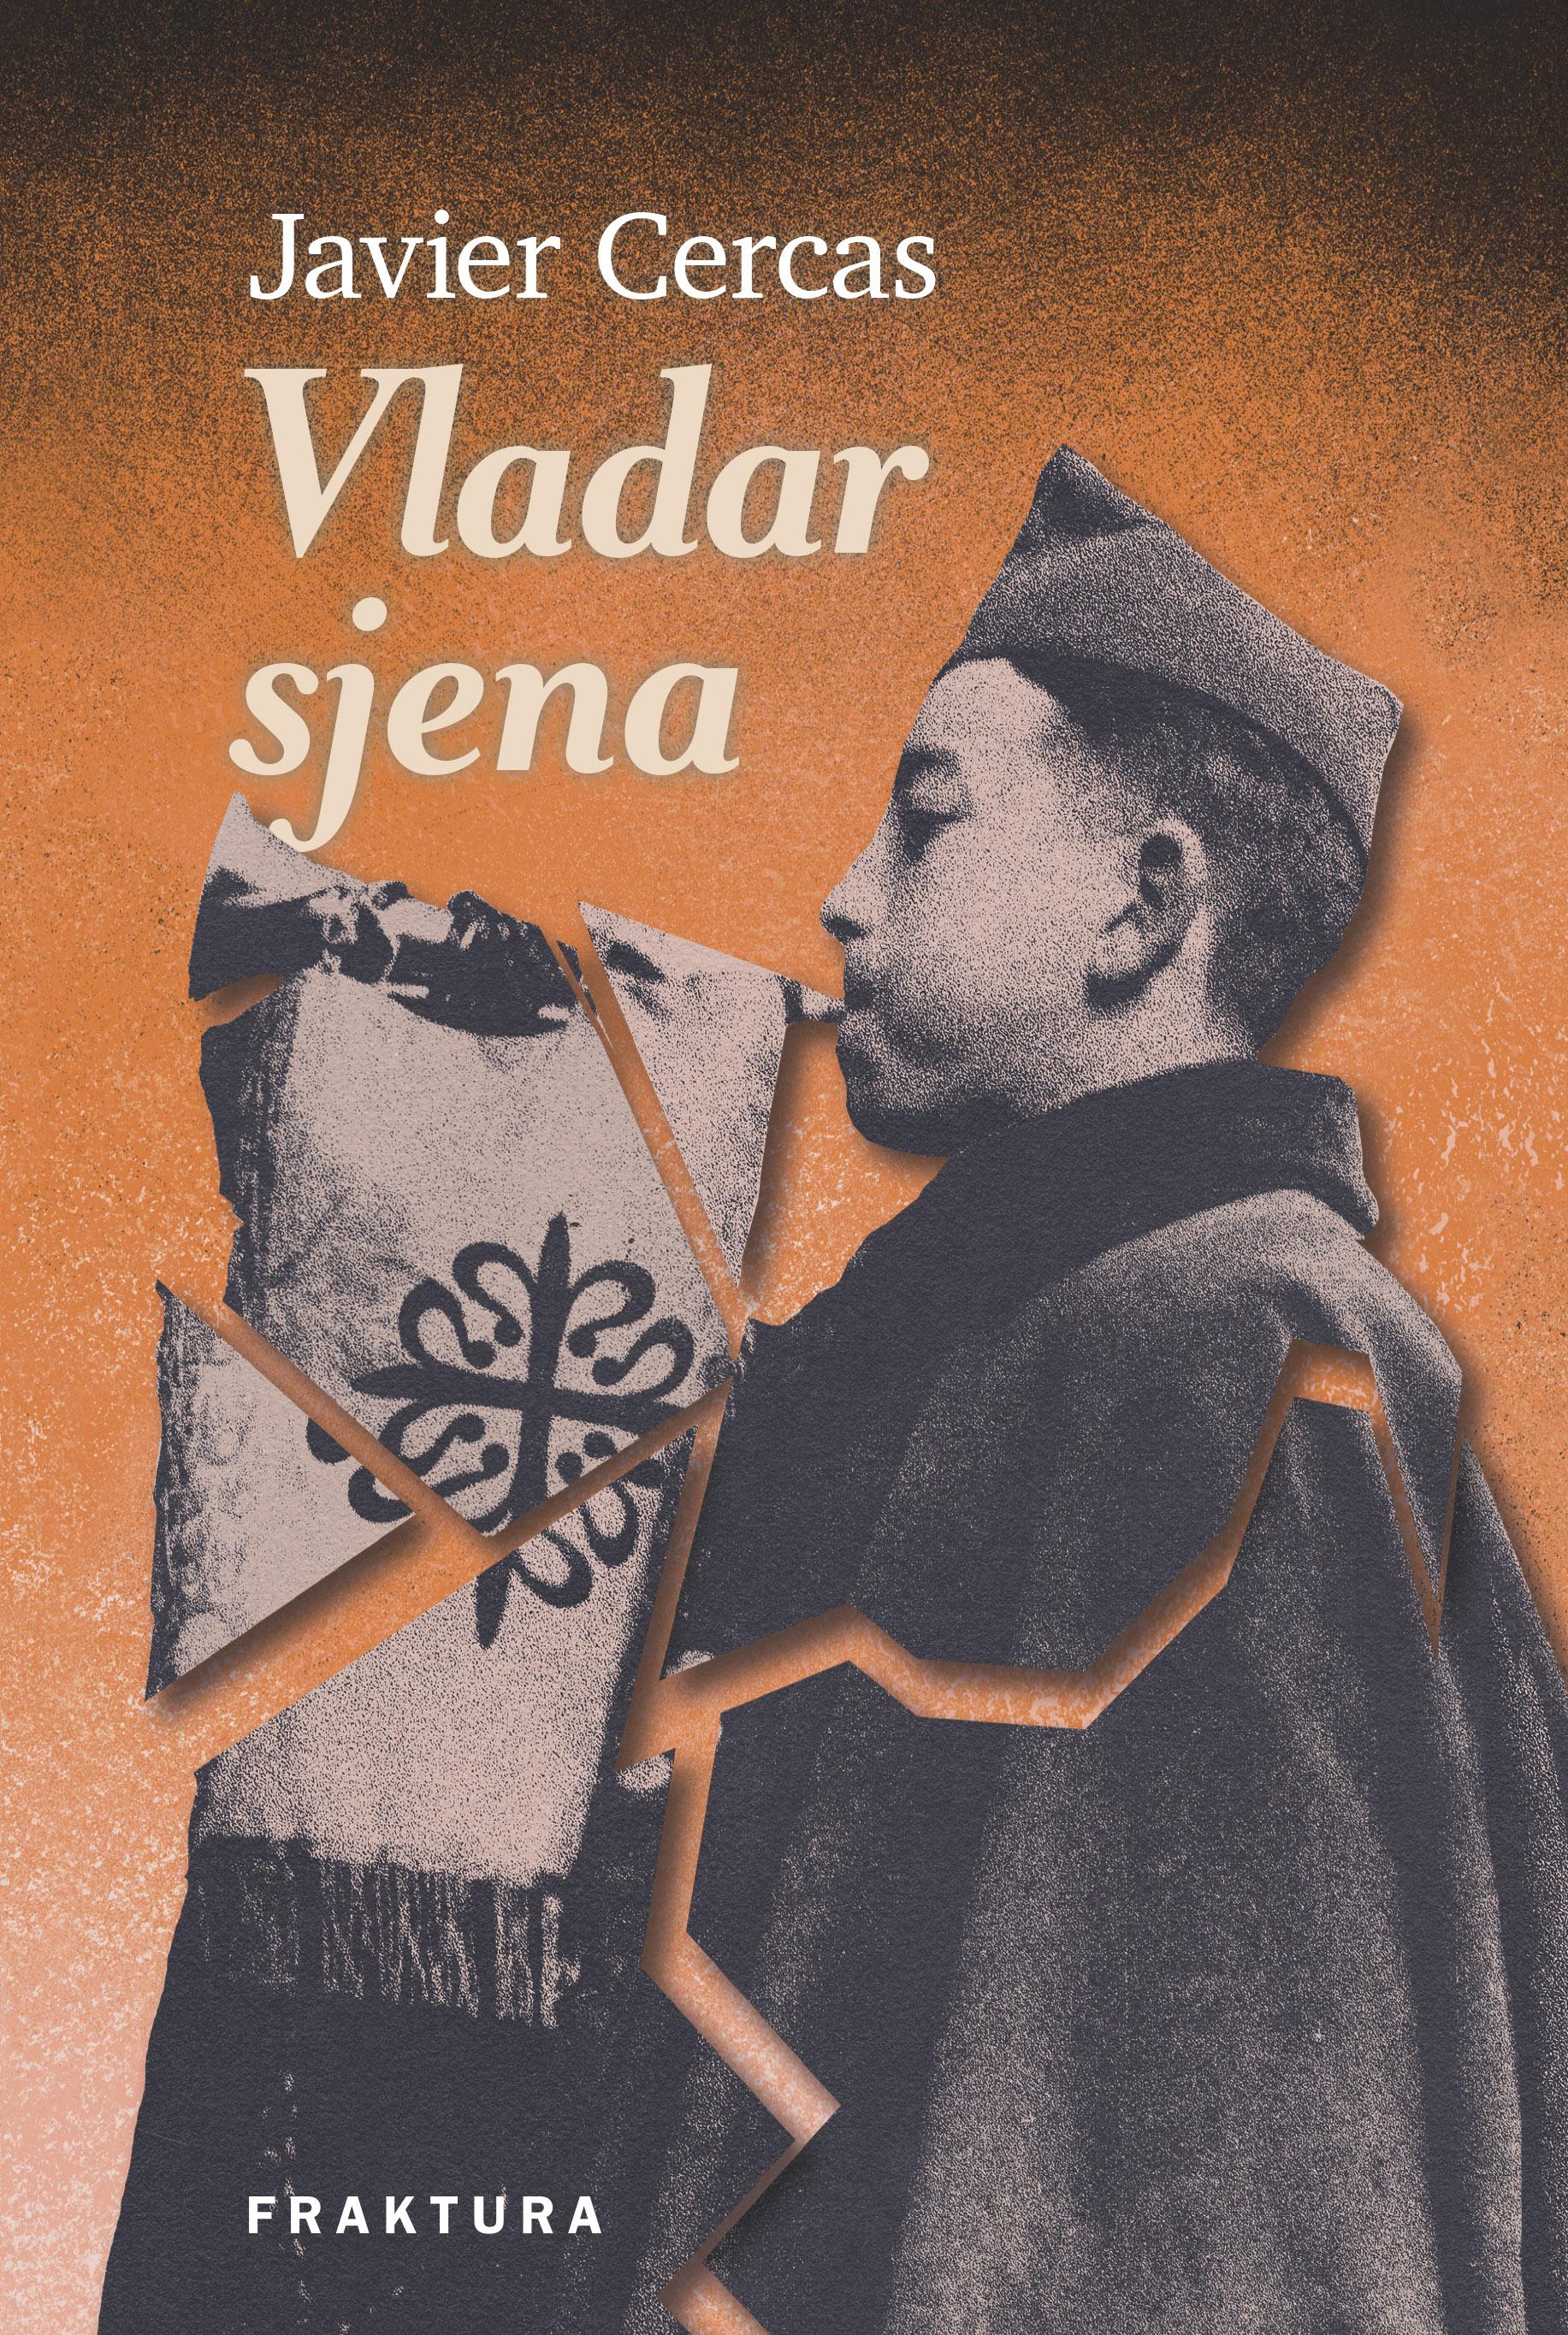 Javier Cercas: Priča o Manuelu Meni (poglavlje iz romana